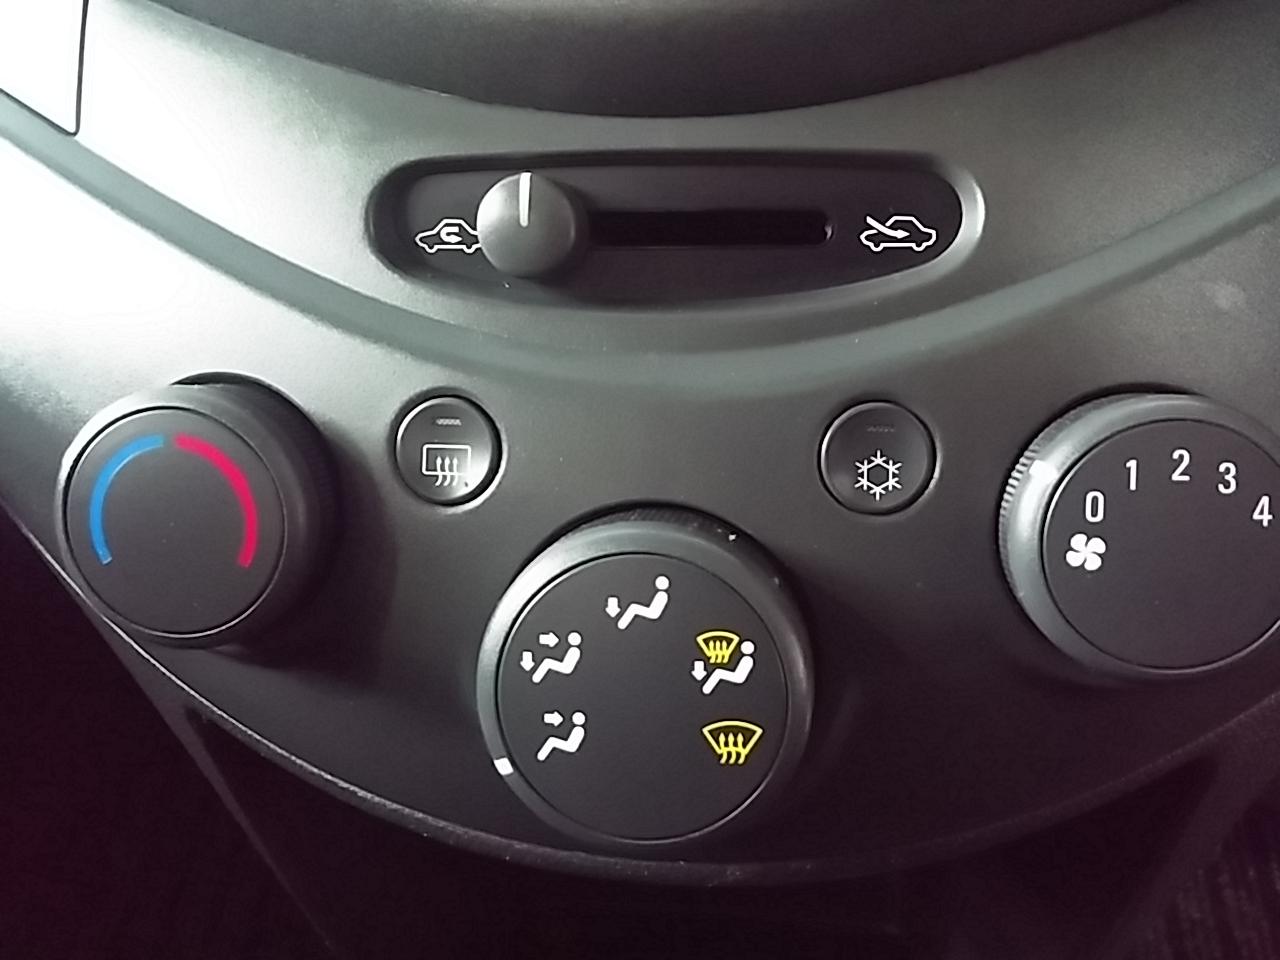 Chevrolet Spark 1.2 Ls Black Edition 5dr